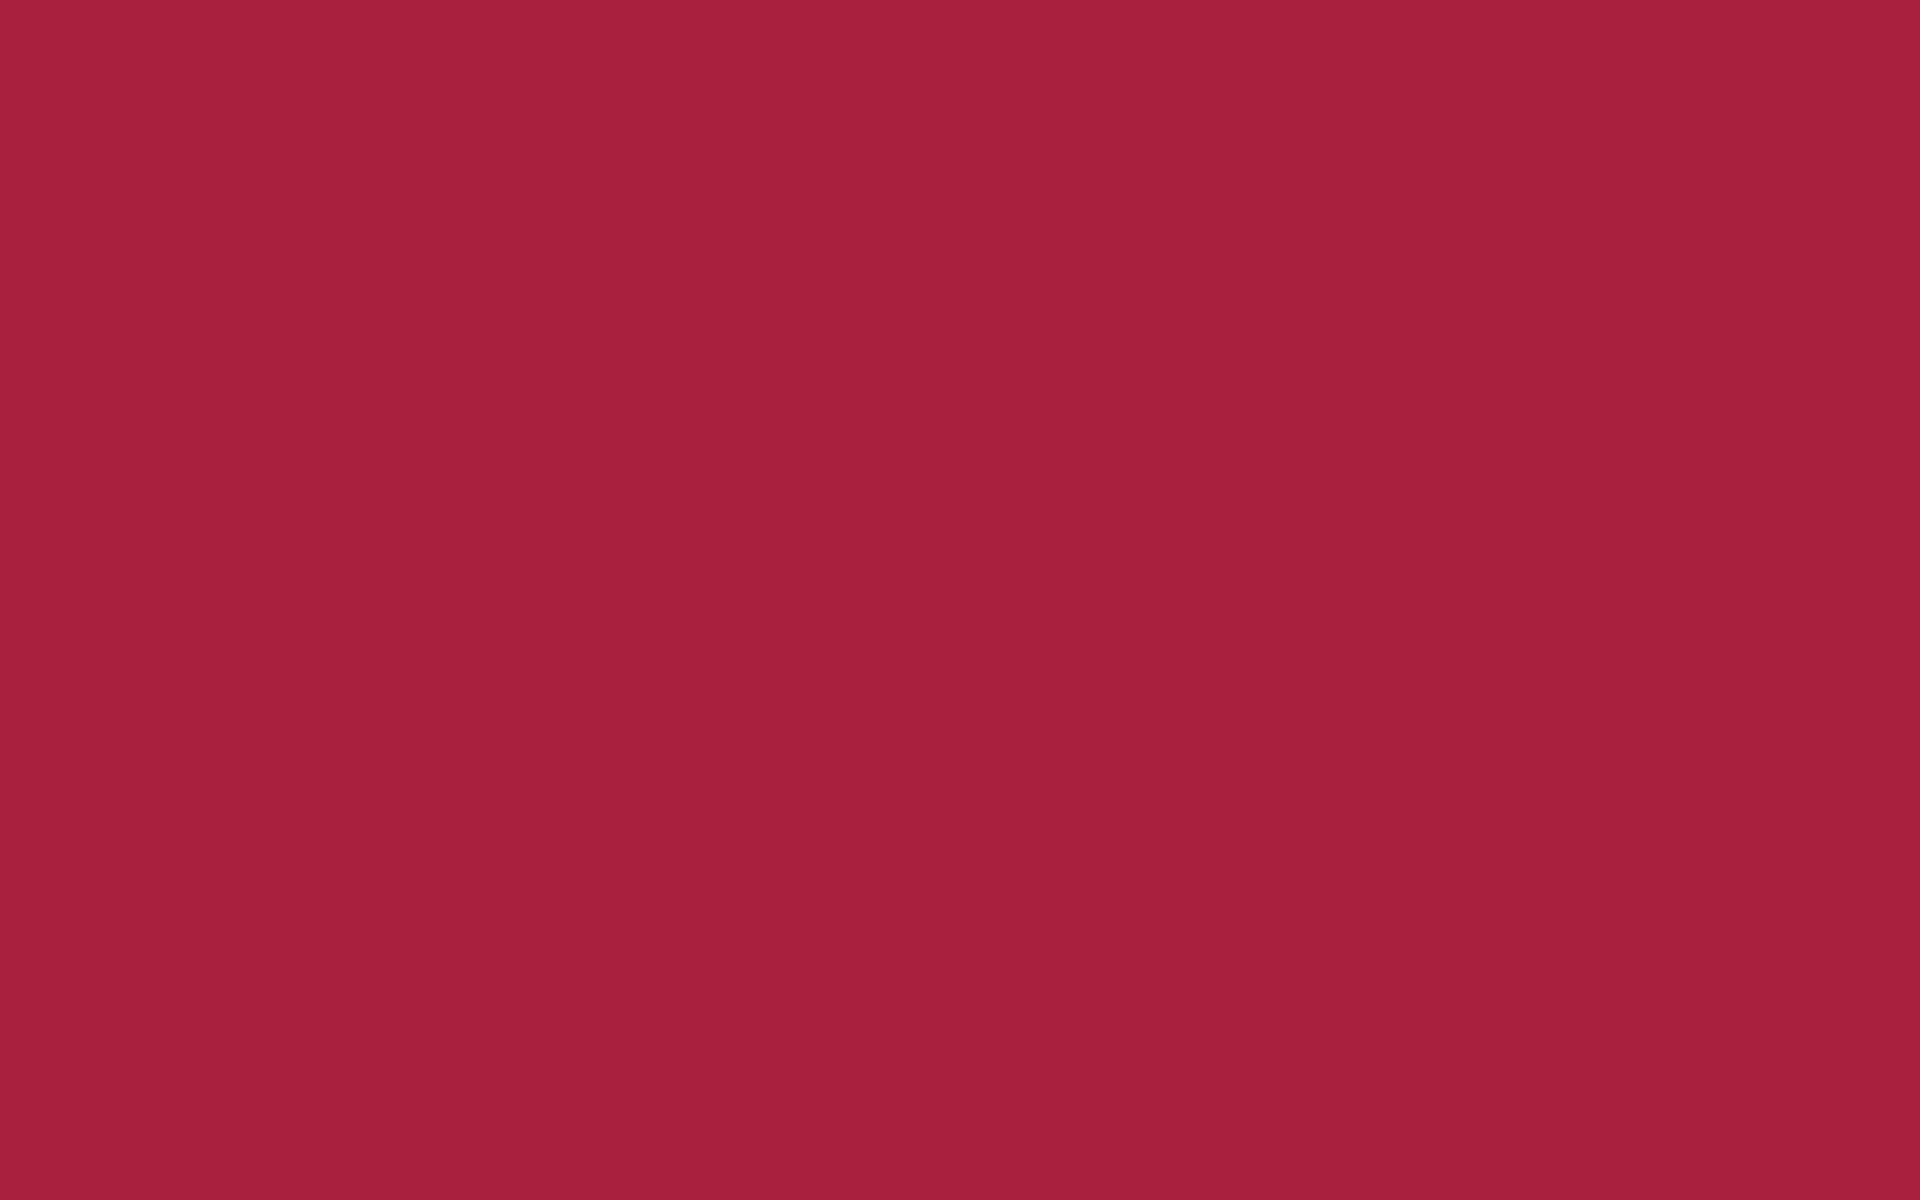 1920x1200 Deep Carmine Solid Color Background